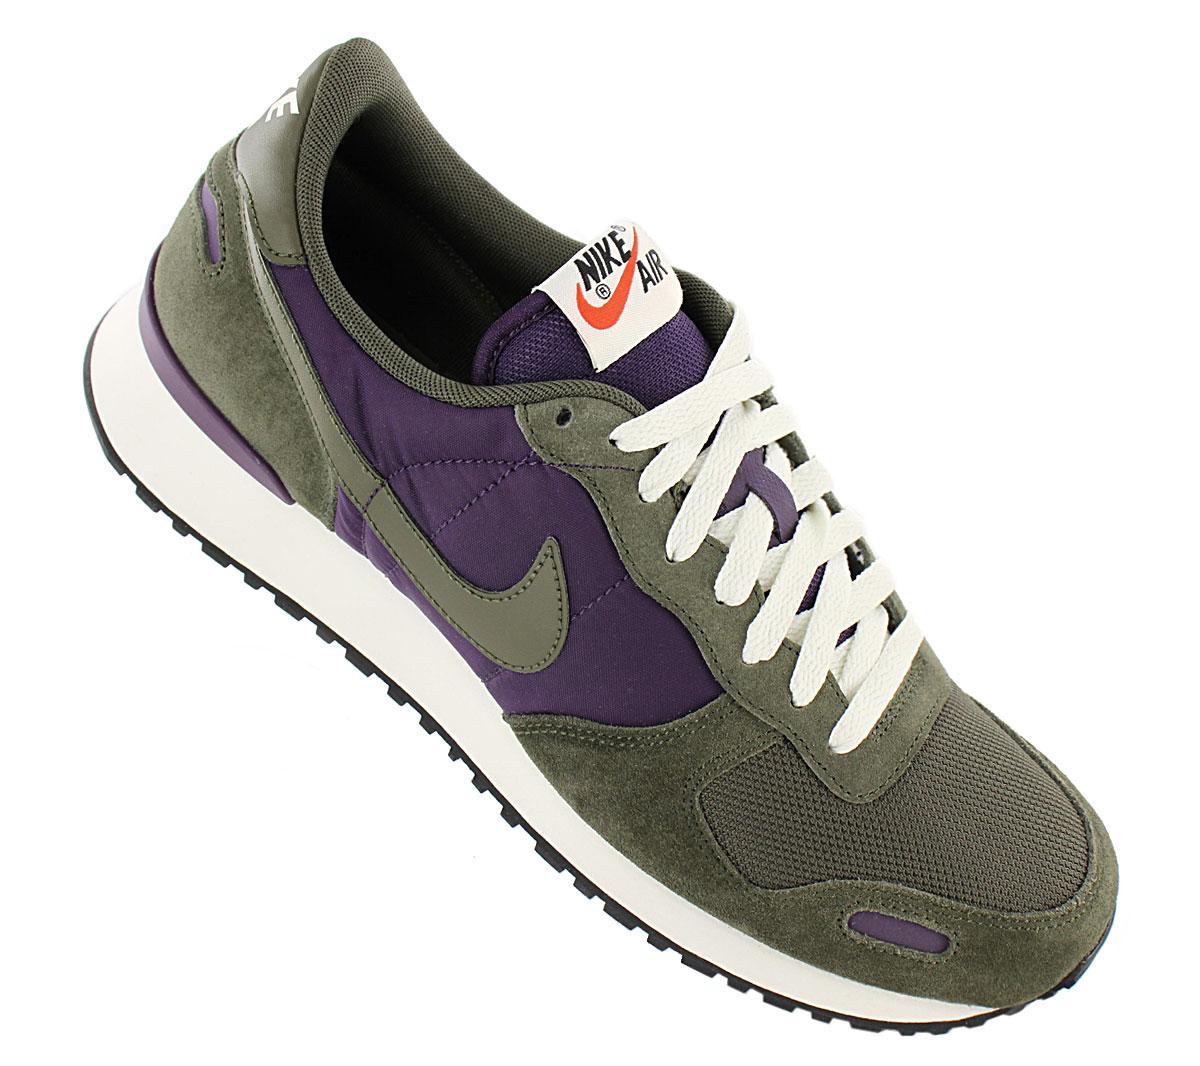 Detalles de Nike Air Vortex Hombre Sneaker 903896 500 Grün purple Zapatos Retro Bambas Nuevo